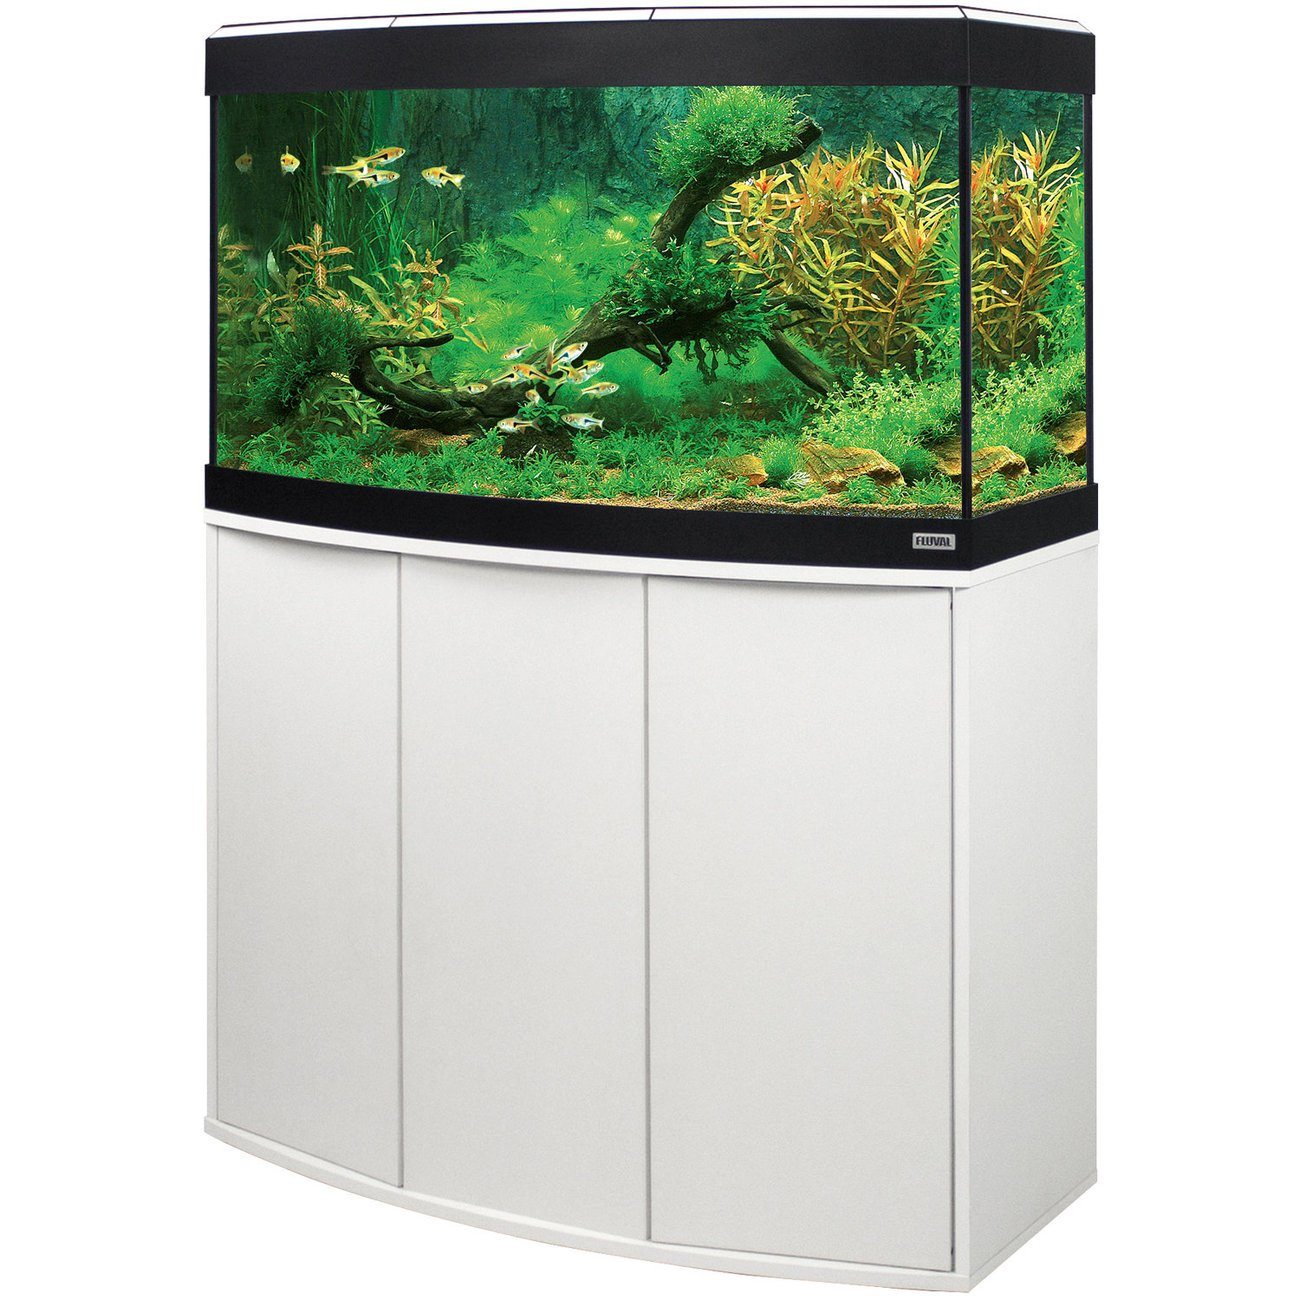 Fluval Vicenza Aquarienkombination, Bild 4